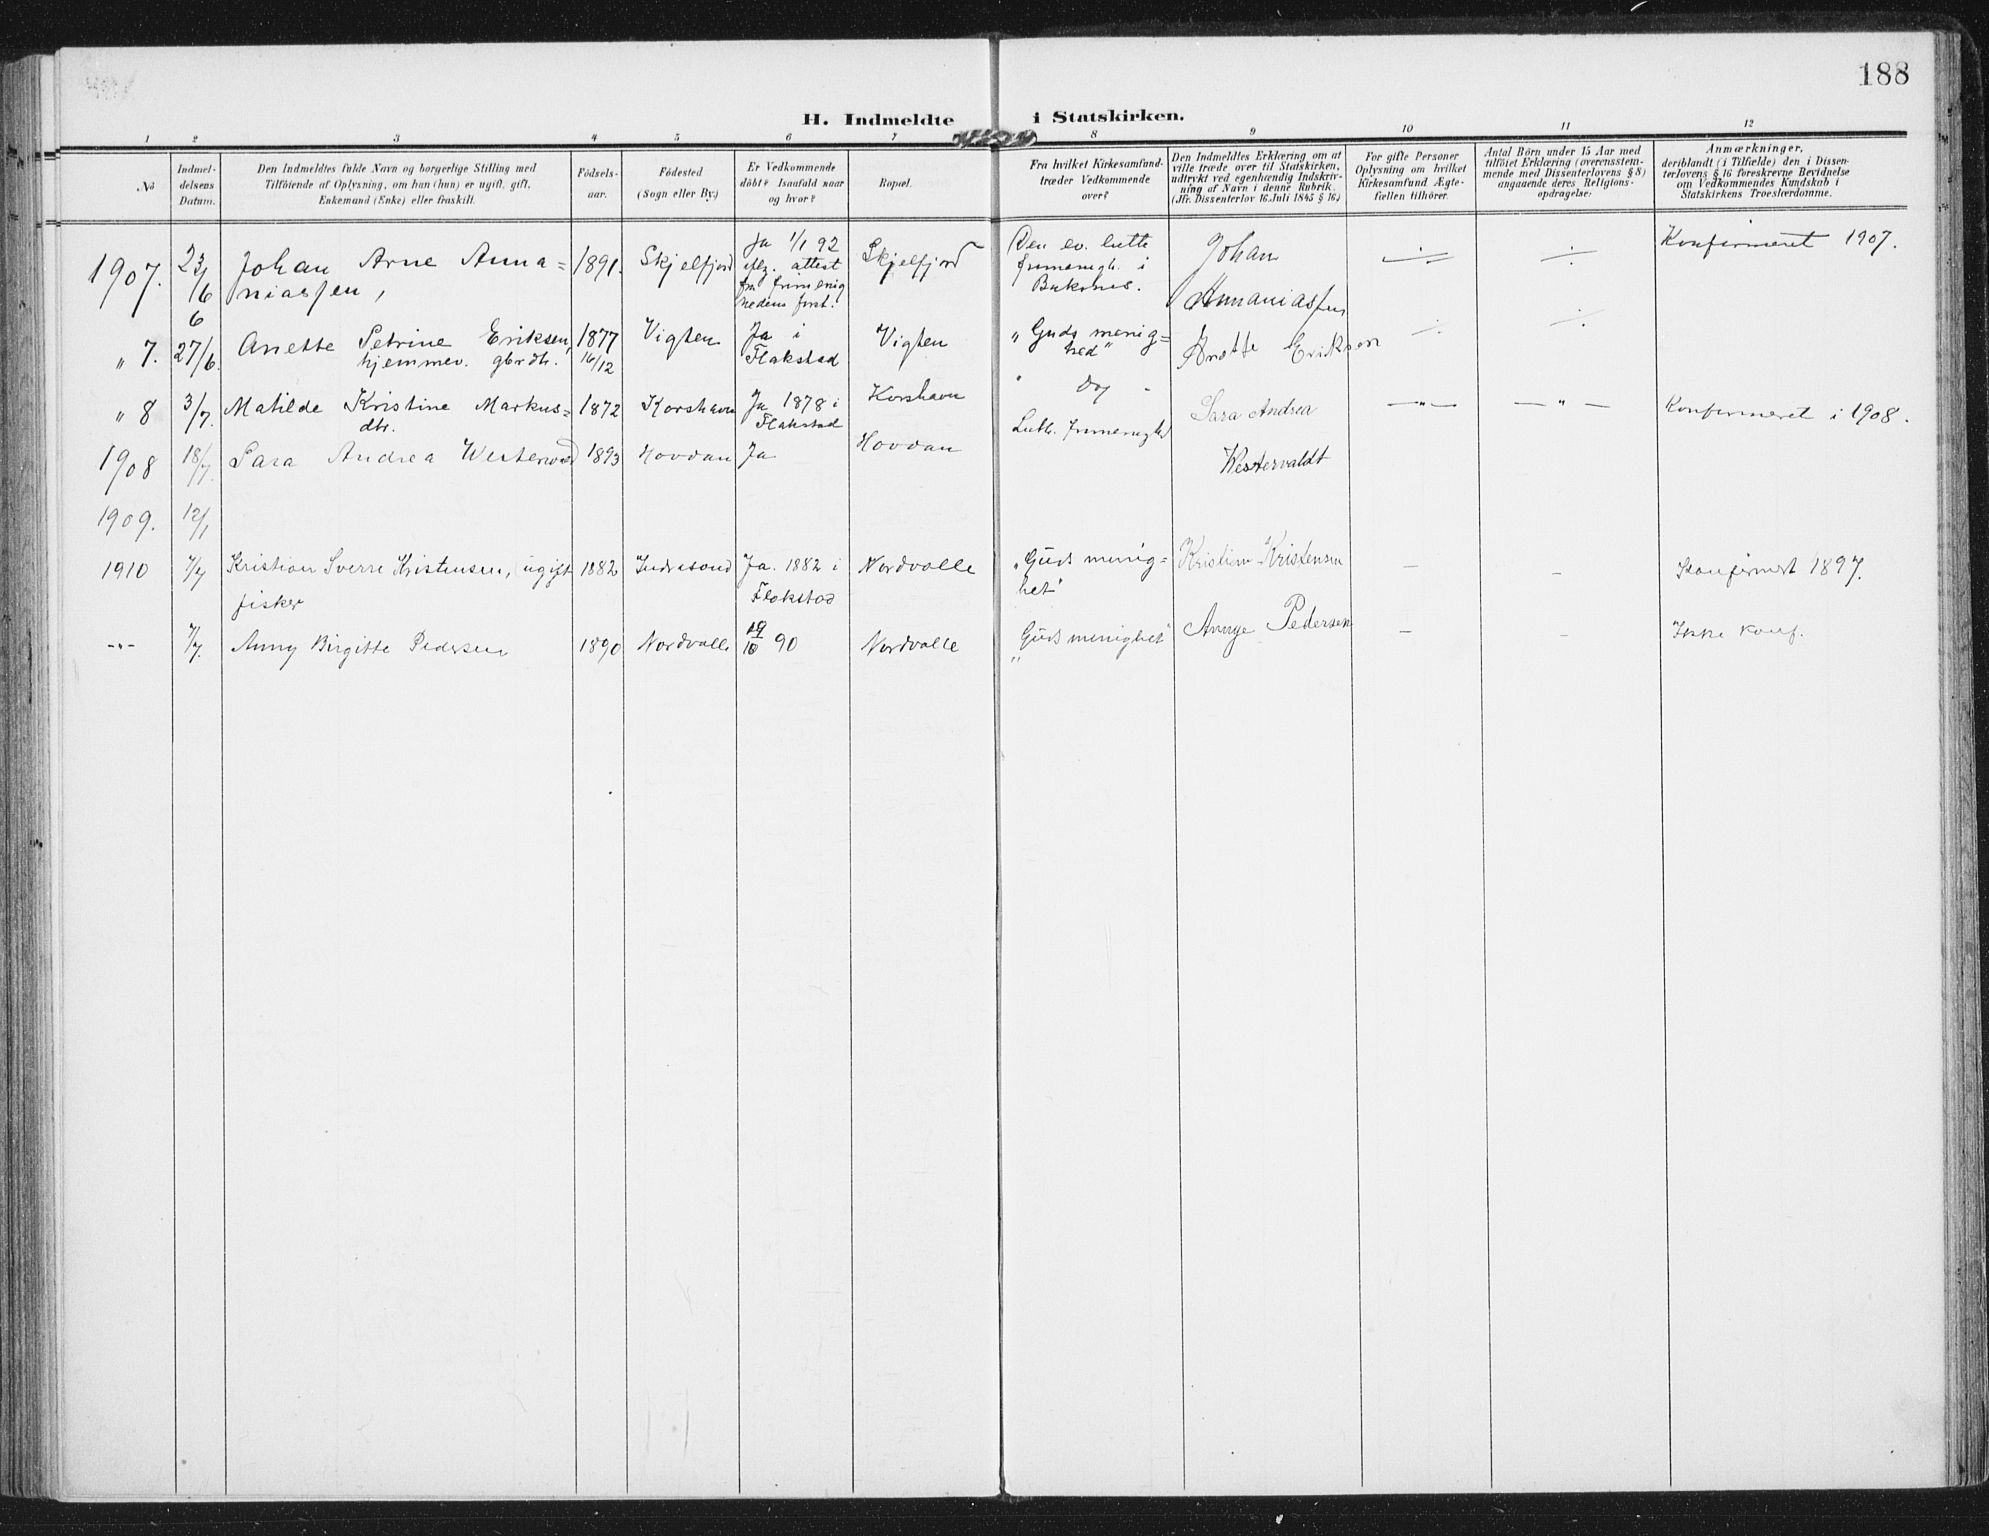 SAT, Ministerialprotokoller, klokkerbøker og fødselsregistre - Nordland, 885/L1206: Ministerialbok nr. 885A07, 1905-1915, s. 188